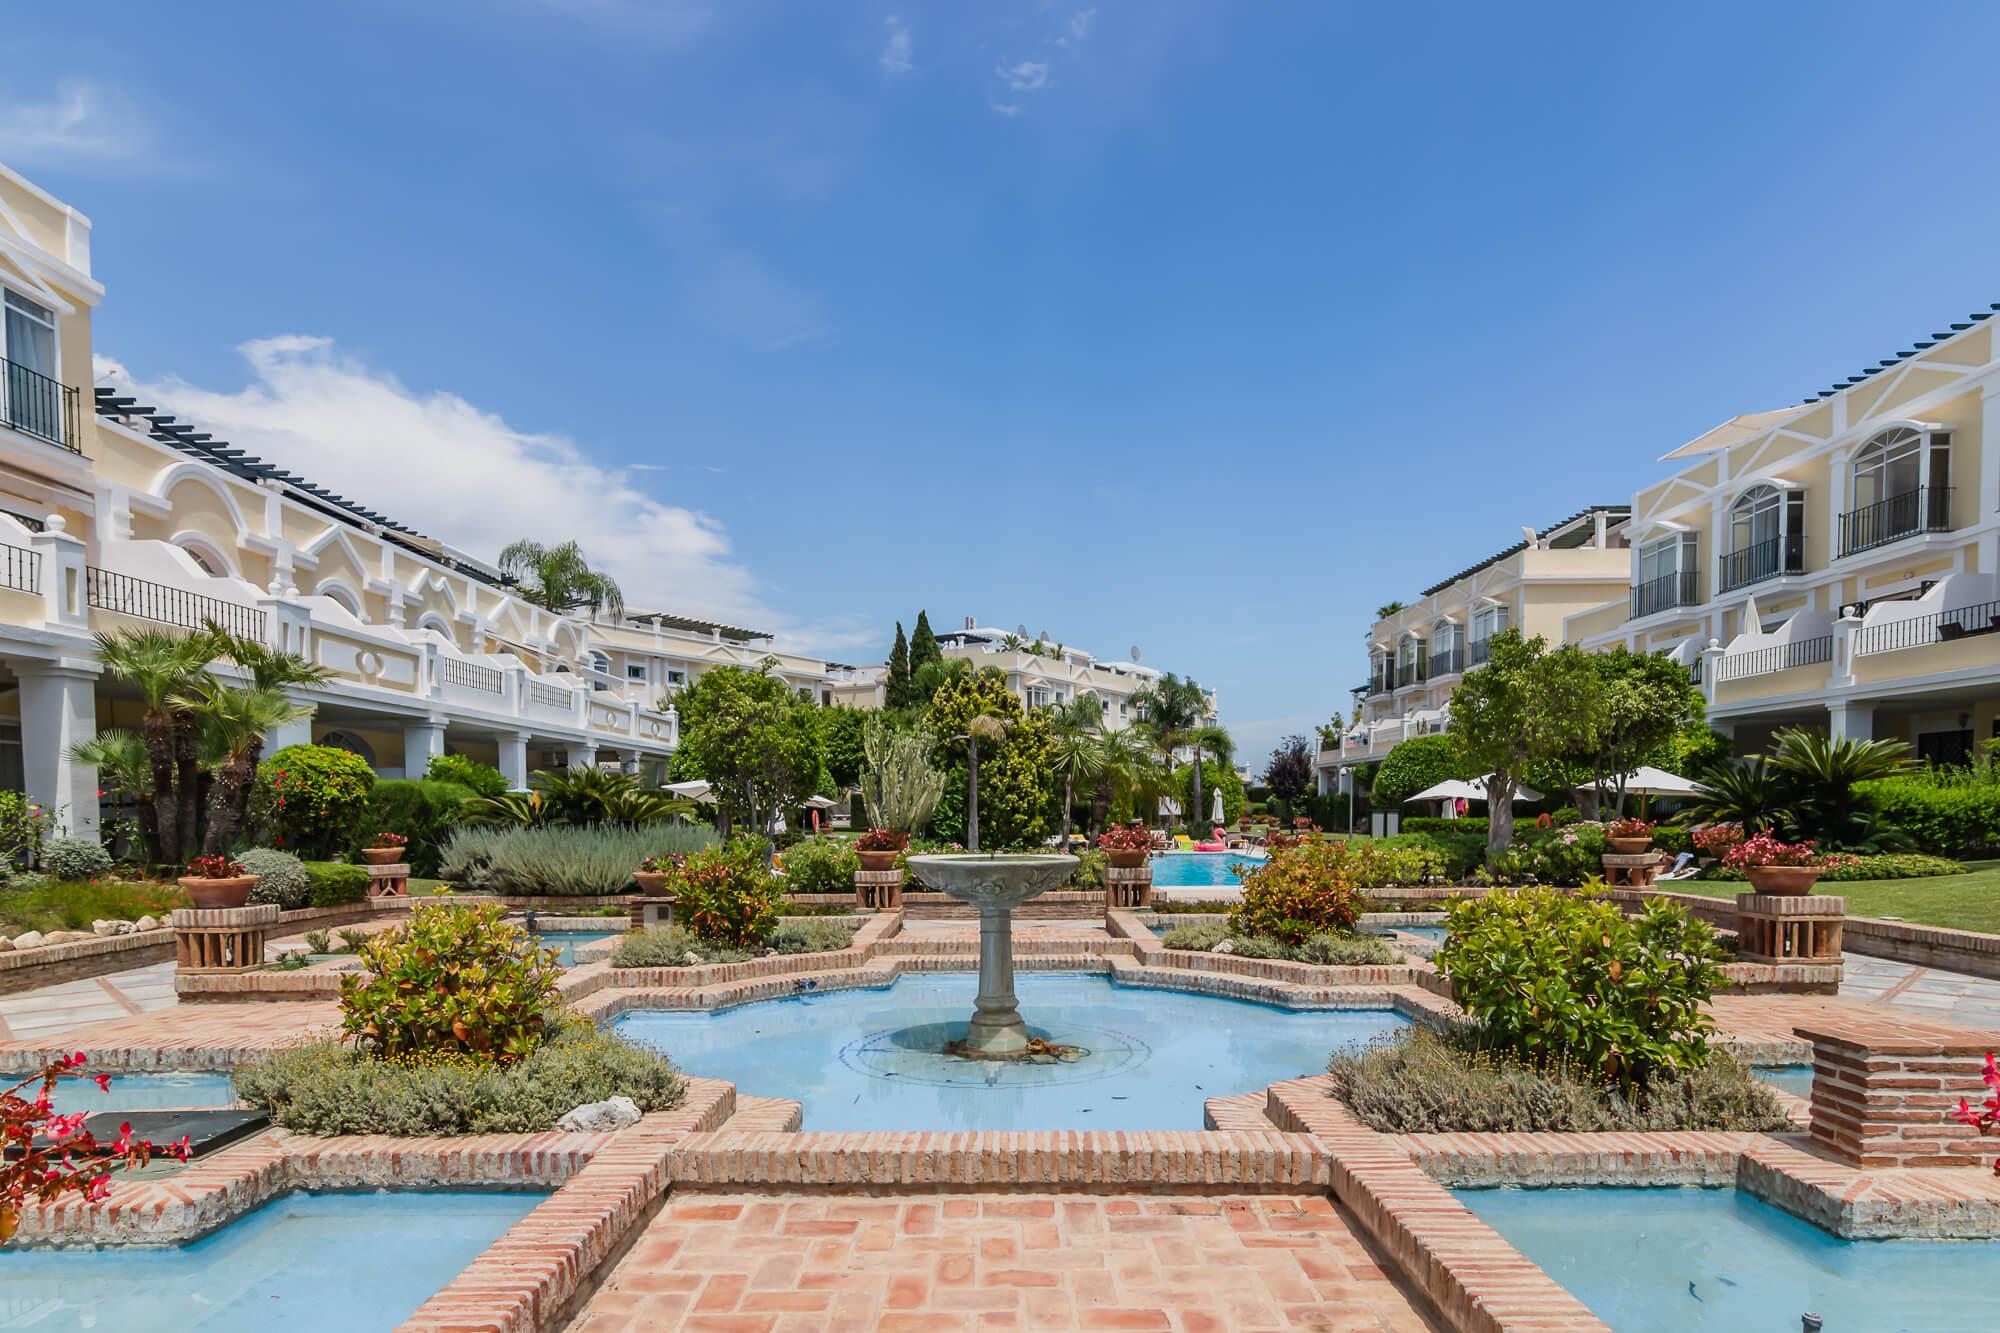 Aloha Gardens Marbella